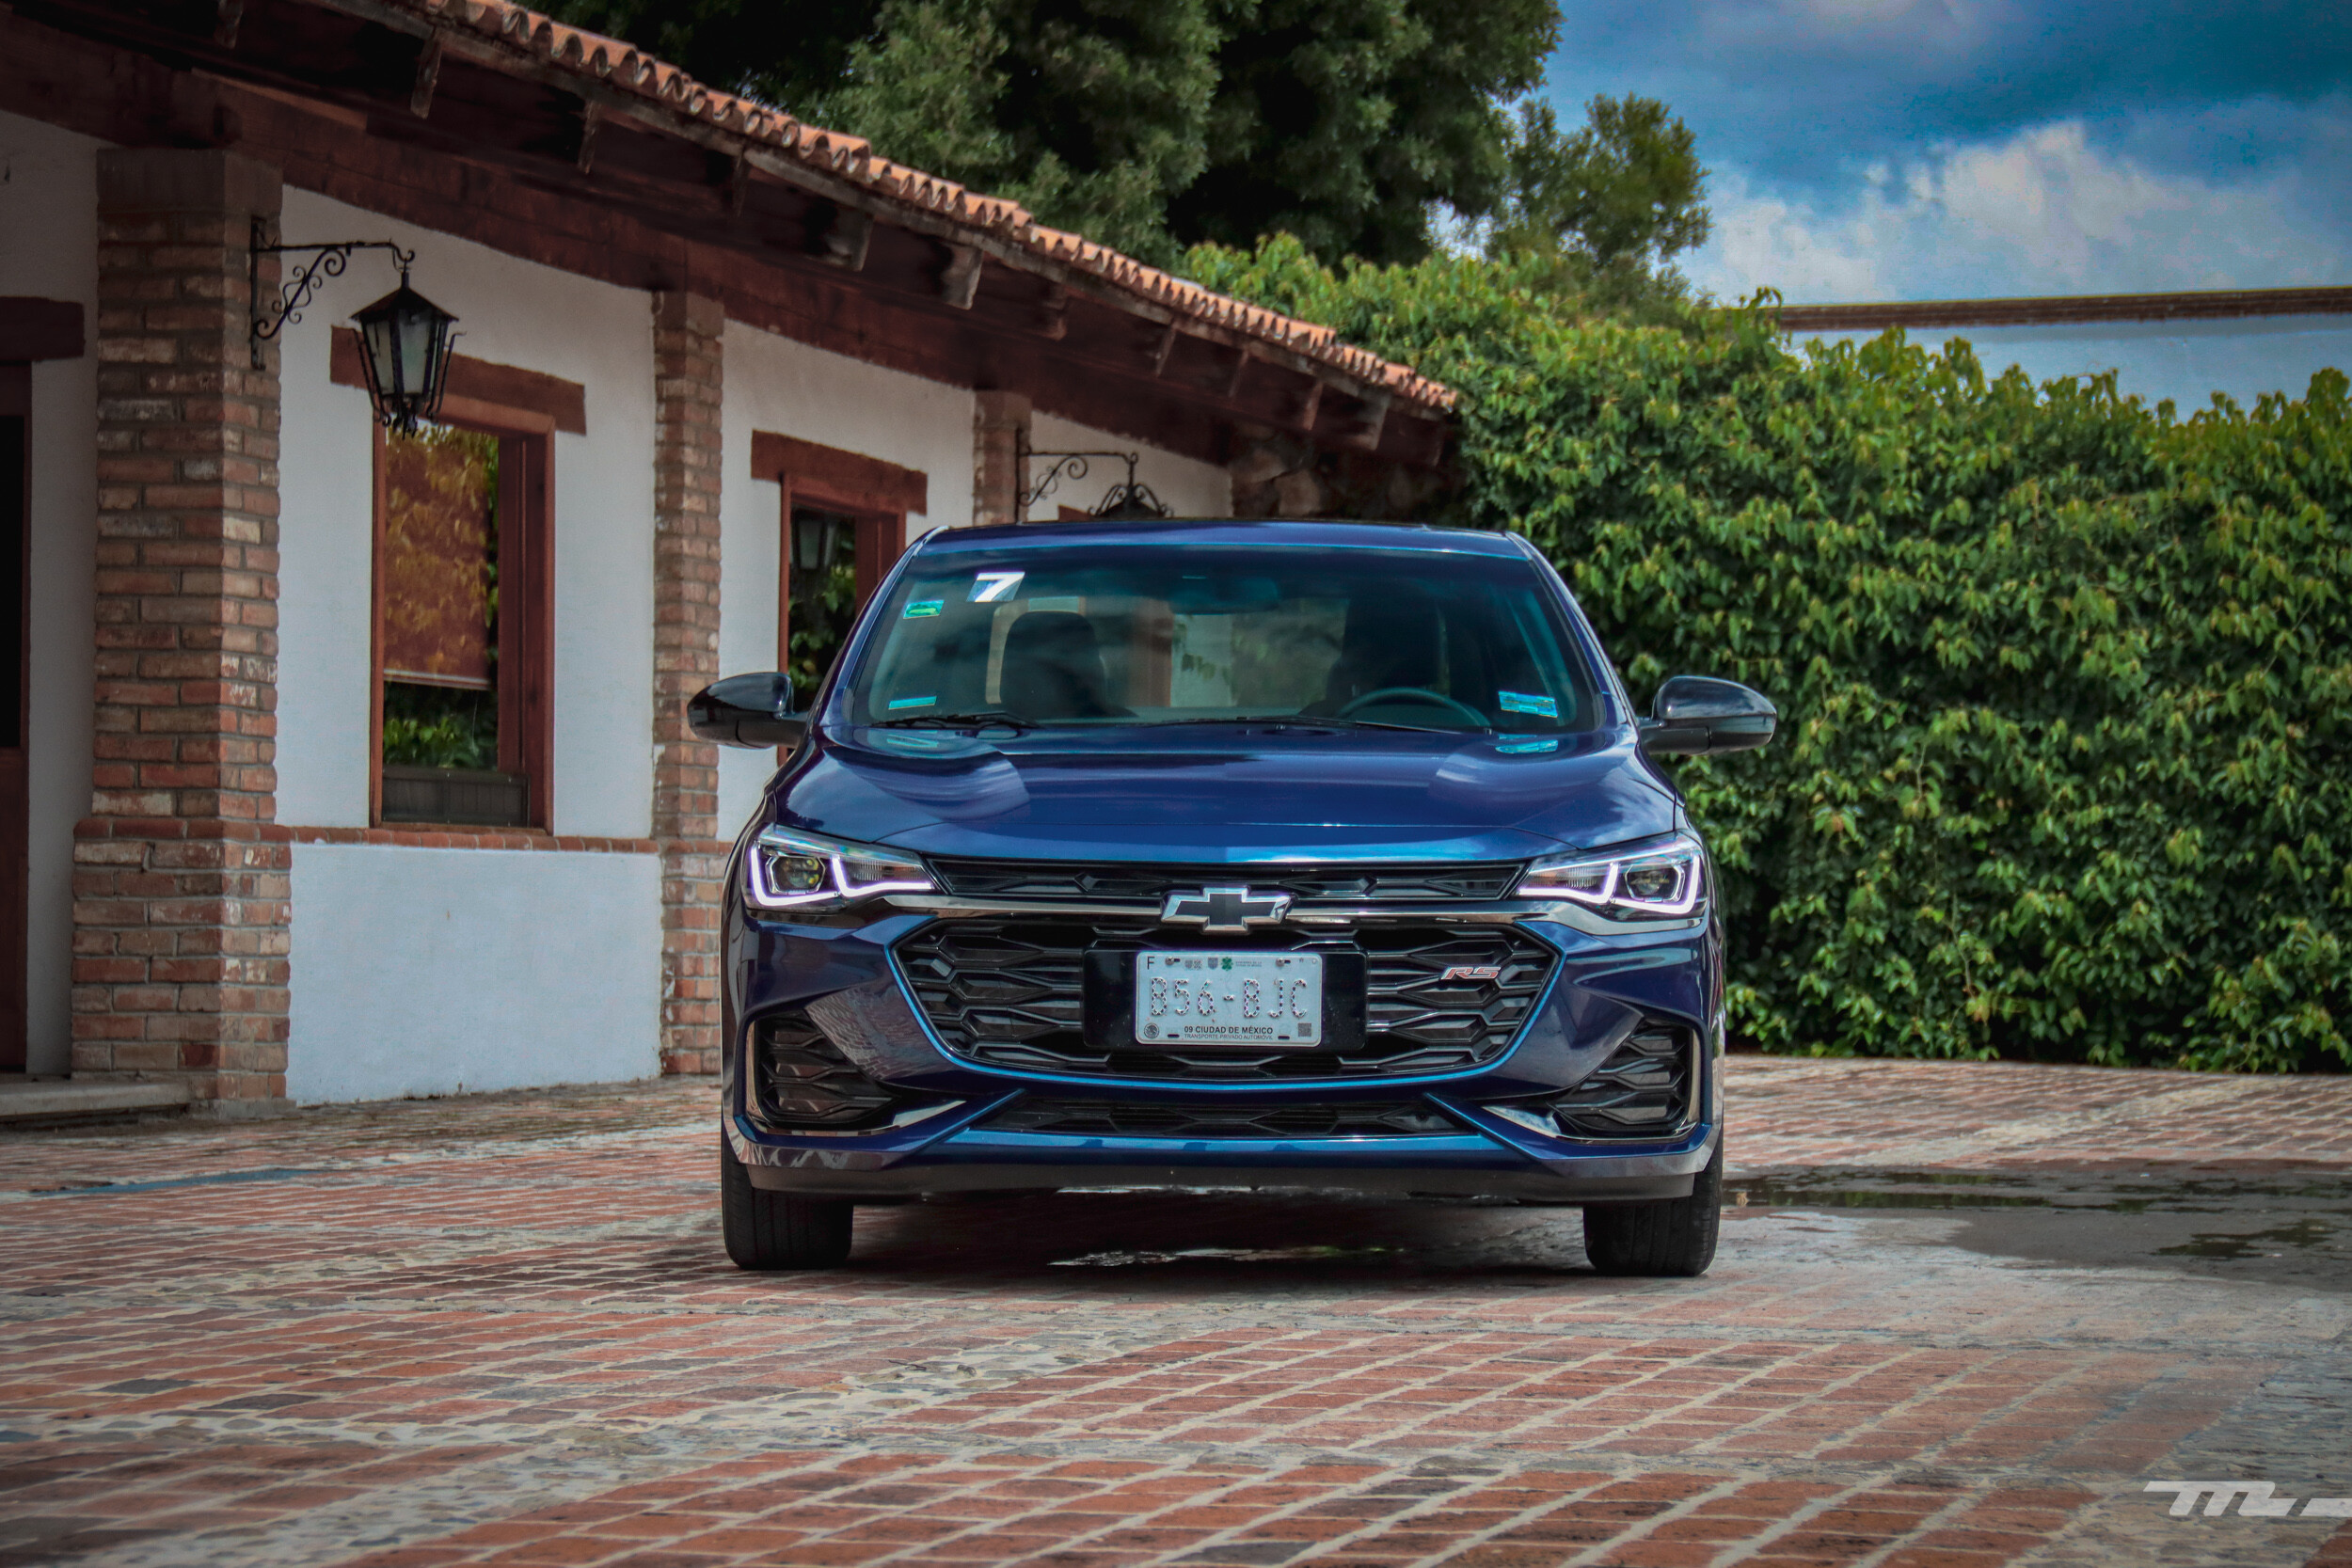 Foto de Chevrolet Cavalier Turbo 2022: Primer vistazo (9/37)